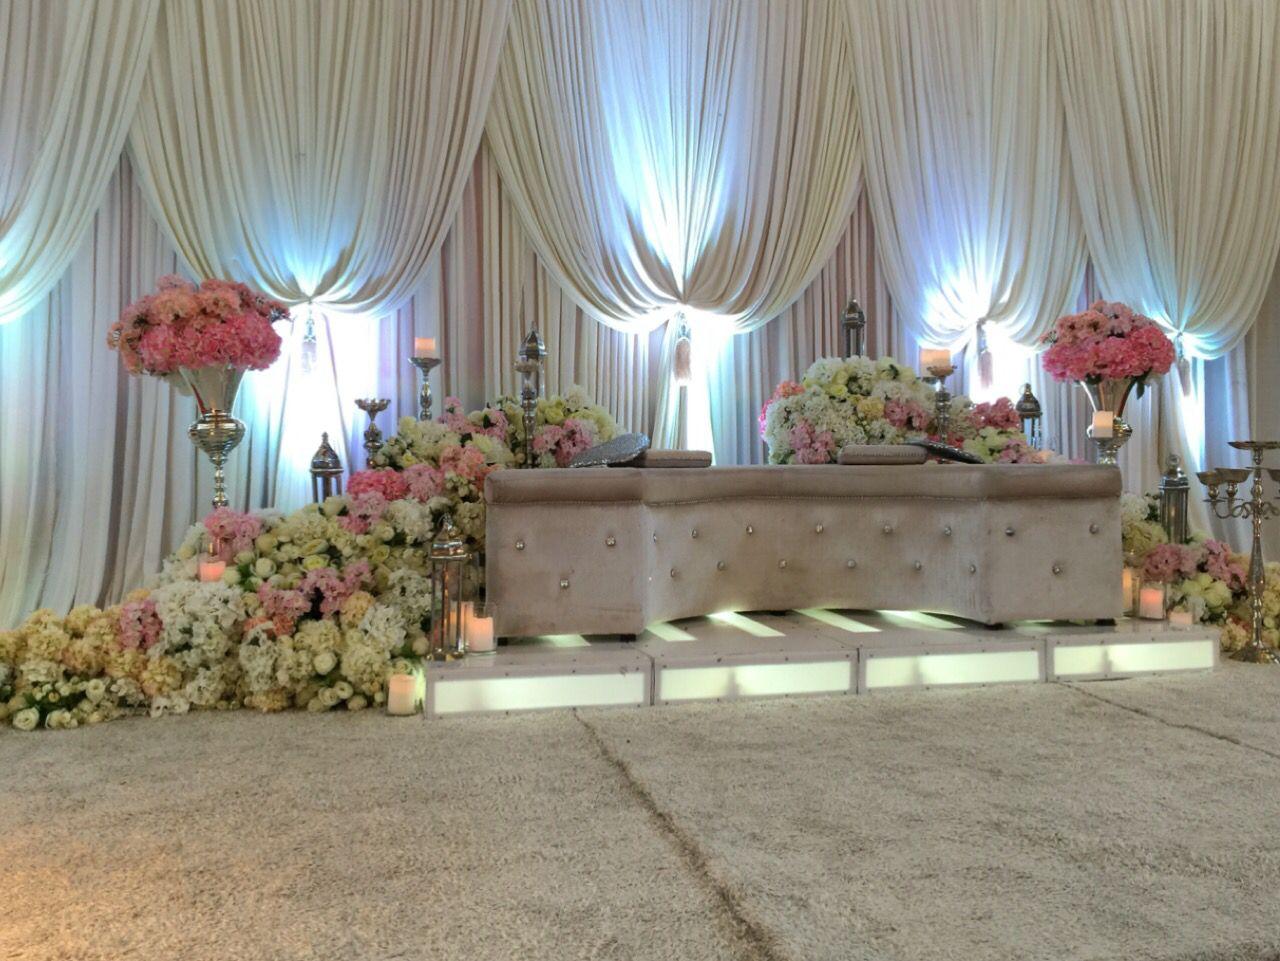 Simple wedding stage decoration at home  ZARA WEDDING CONCEPT Kota Kinabalu ZARAWEDCONCEPT on Pinterest